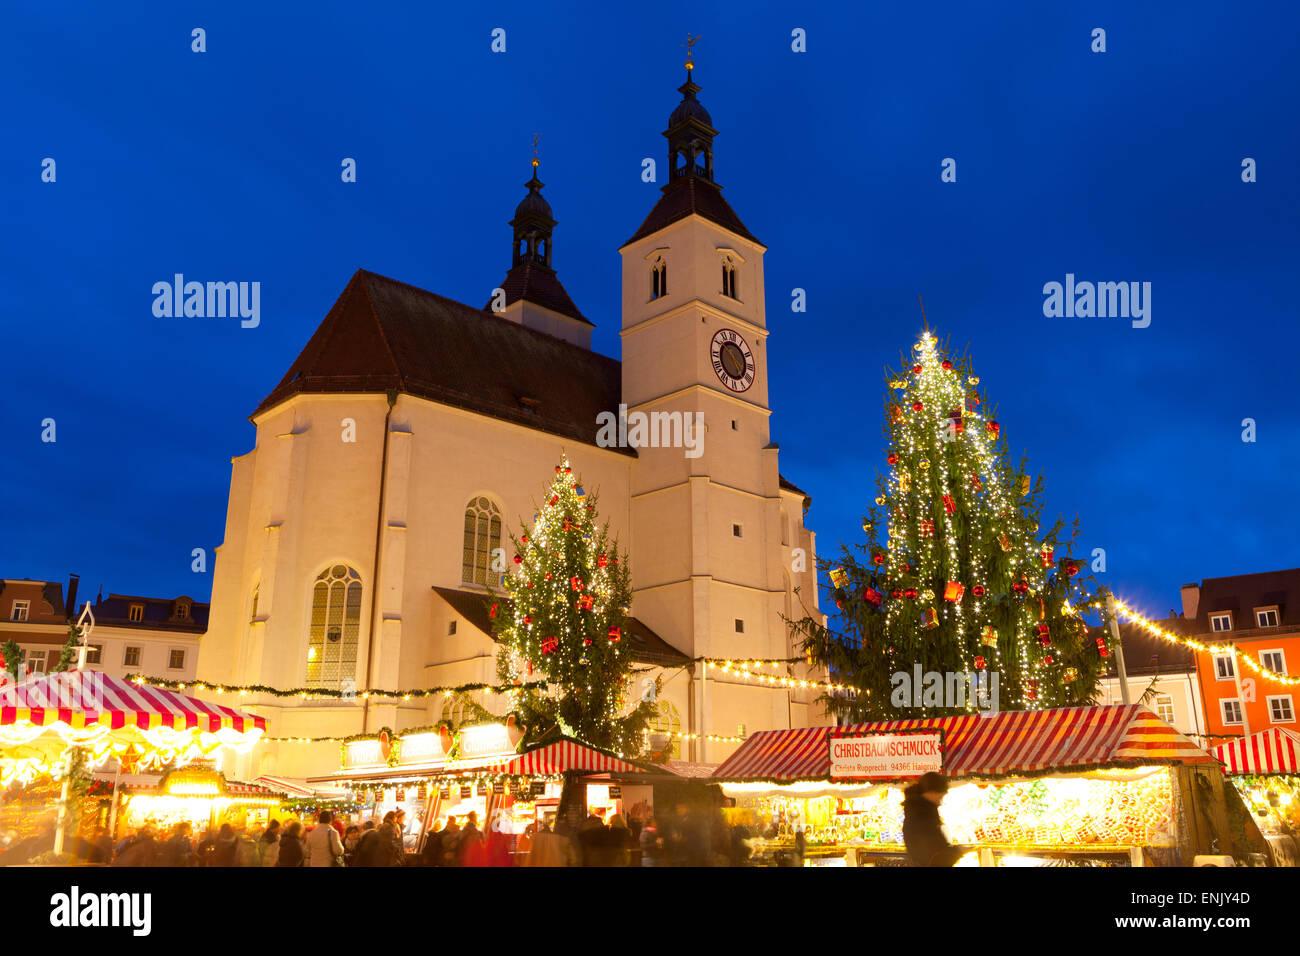 Christmas Market in Neupfarrplatz, Regensburg, Bavaria, Germany, Europe - Stock Image